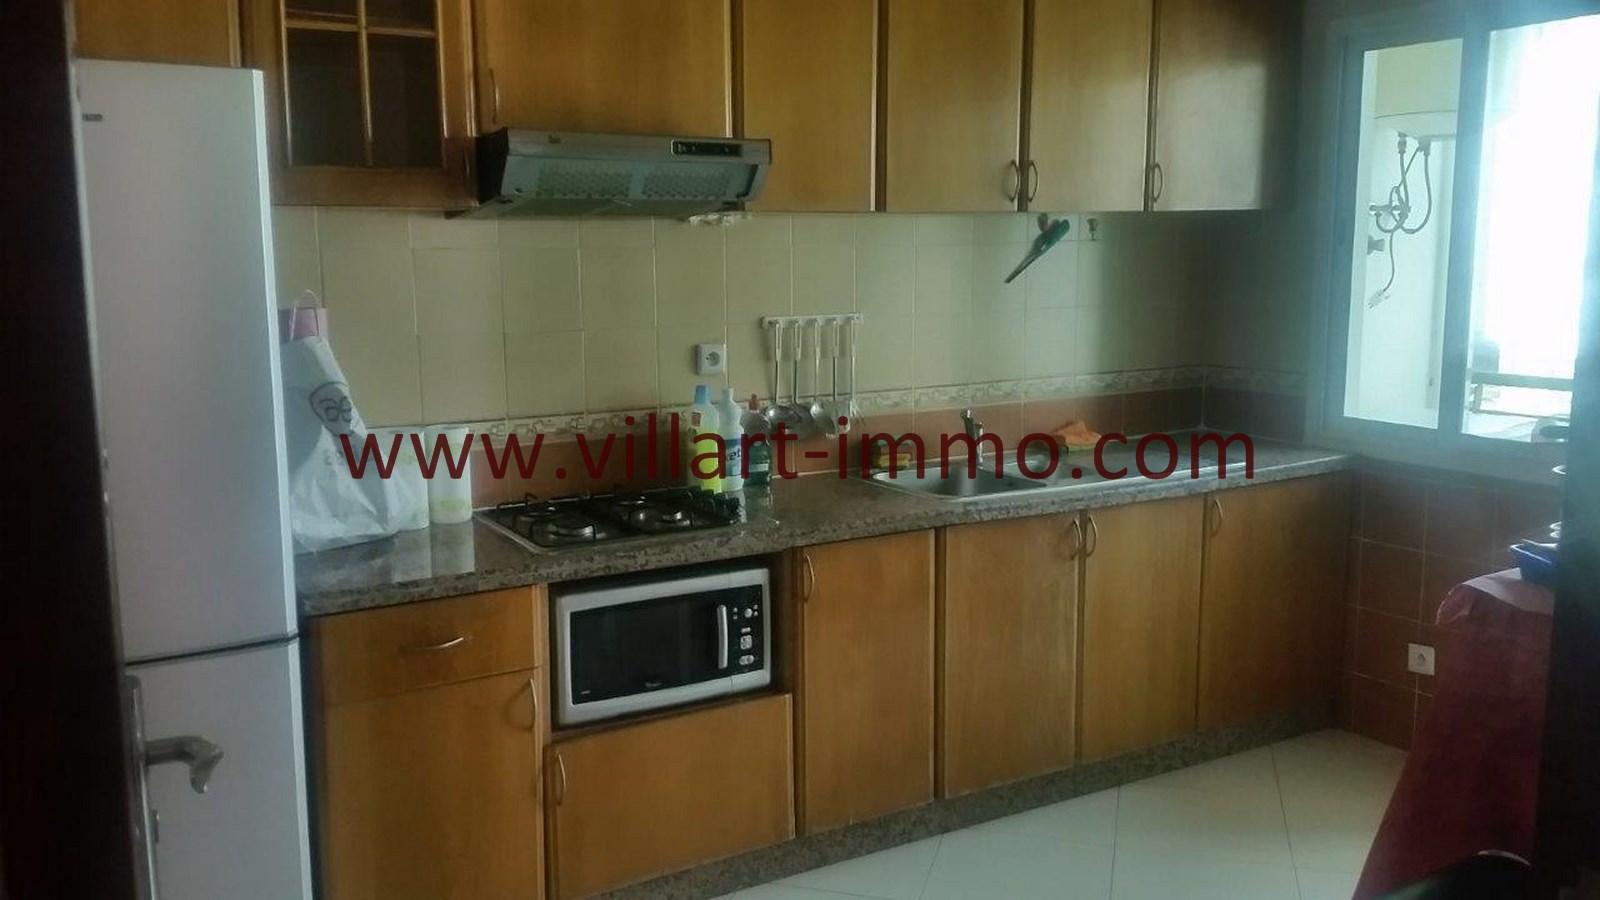 7-location-appartement-meuble-tanger-cuisine-l955-villart-immo